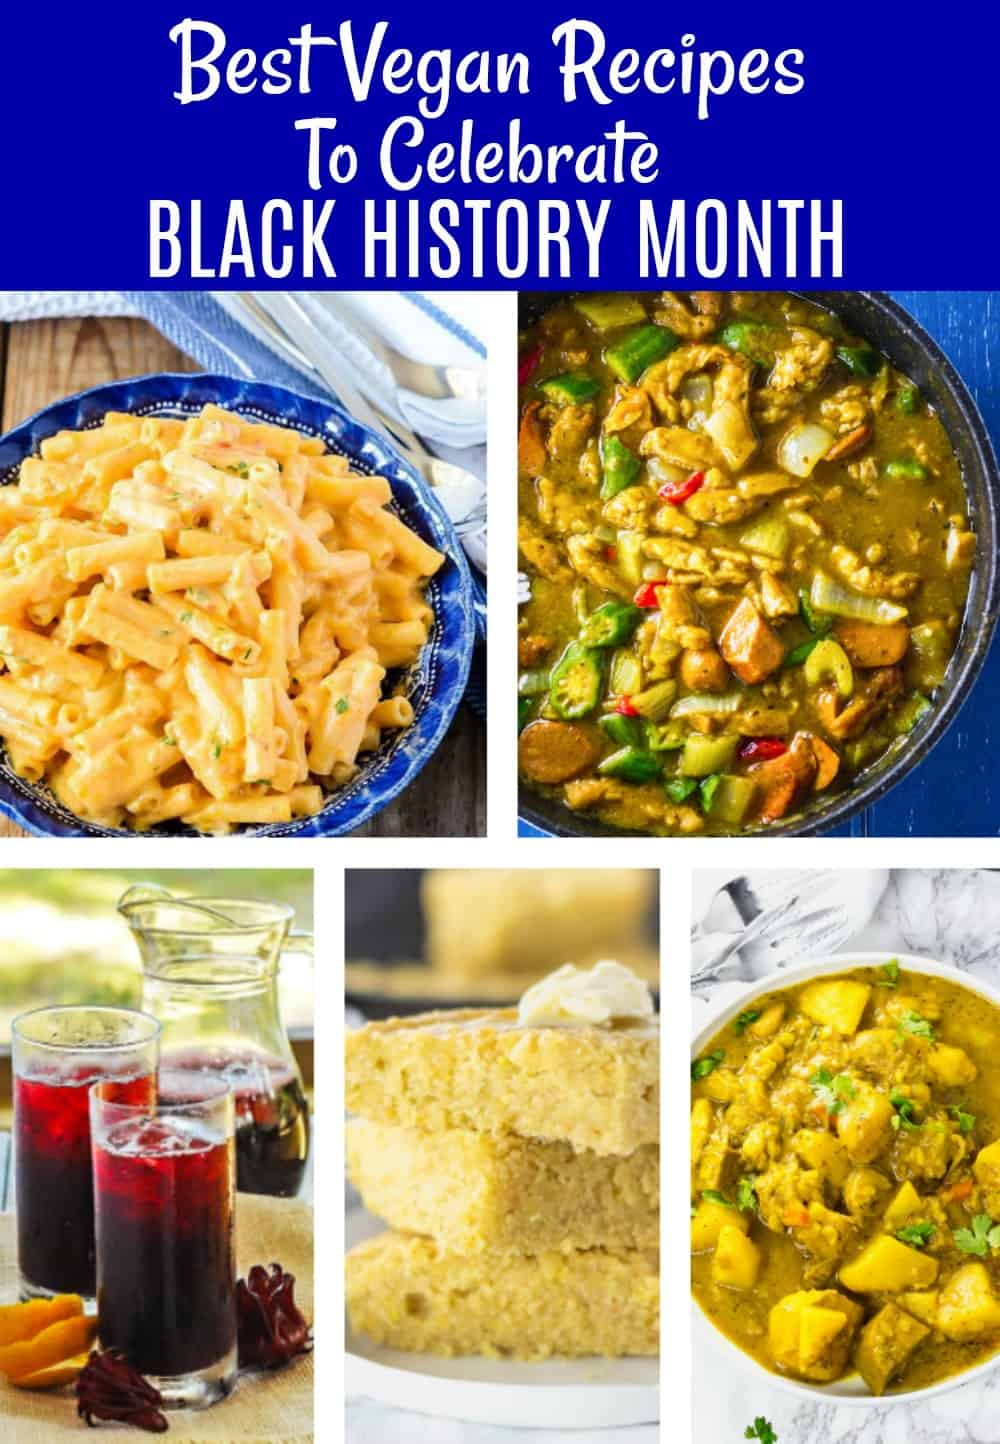 Best Vegan Recipes To Celebrate Black History Month